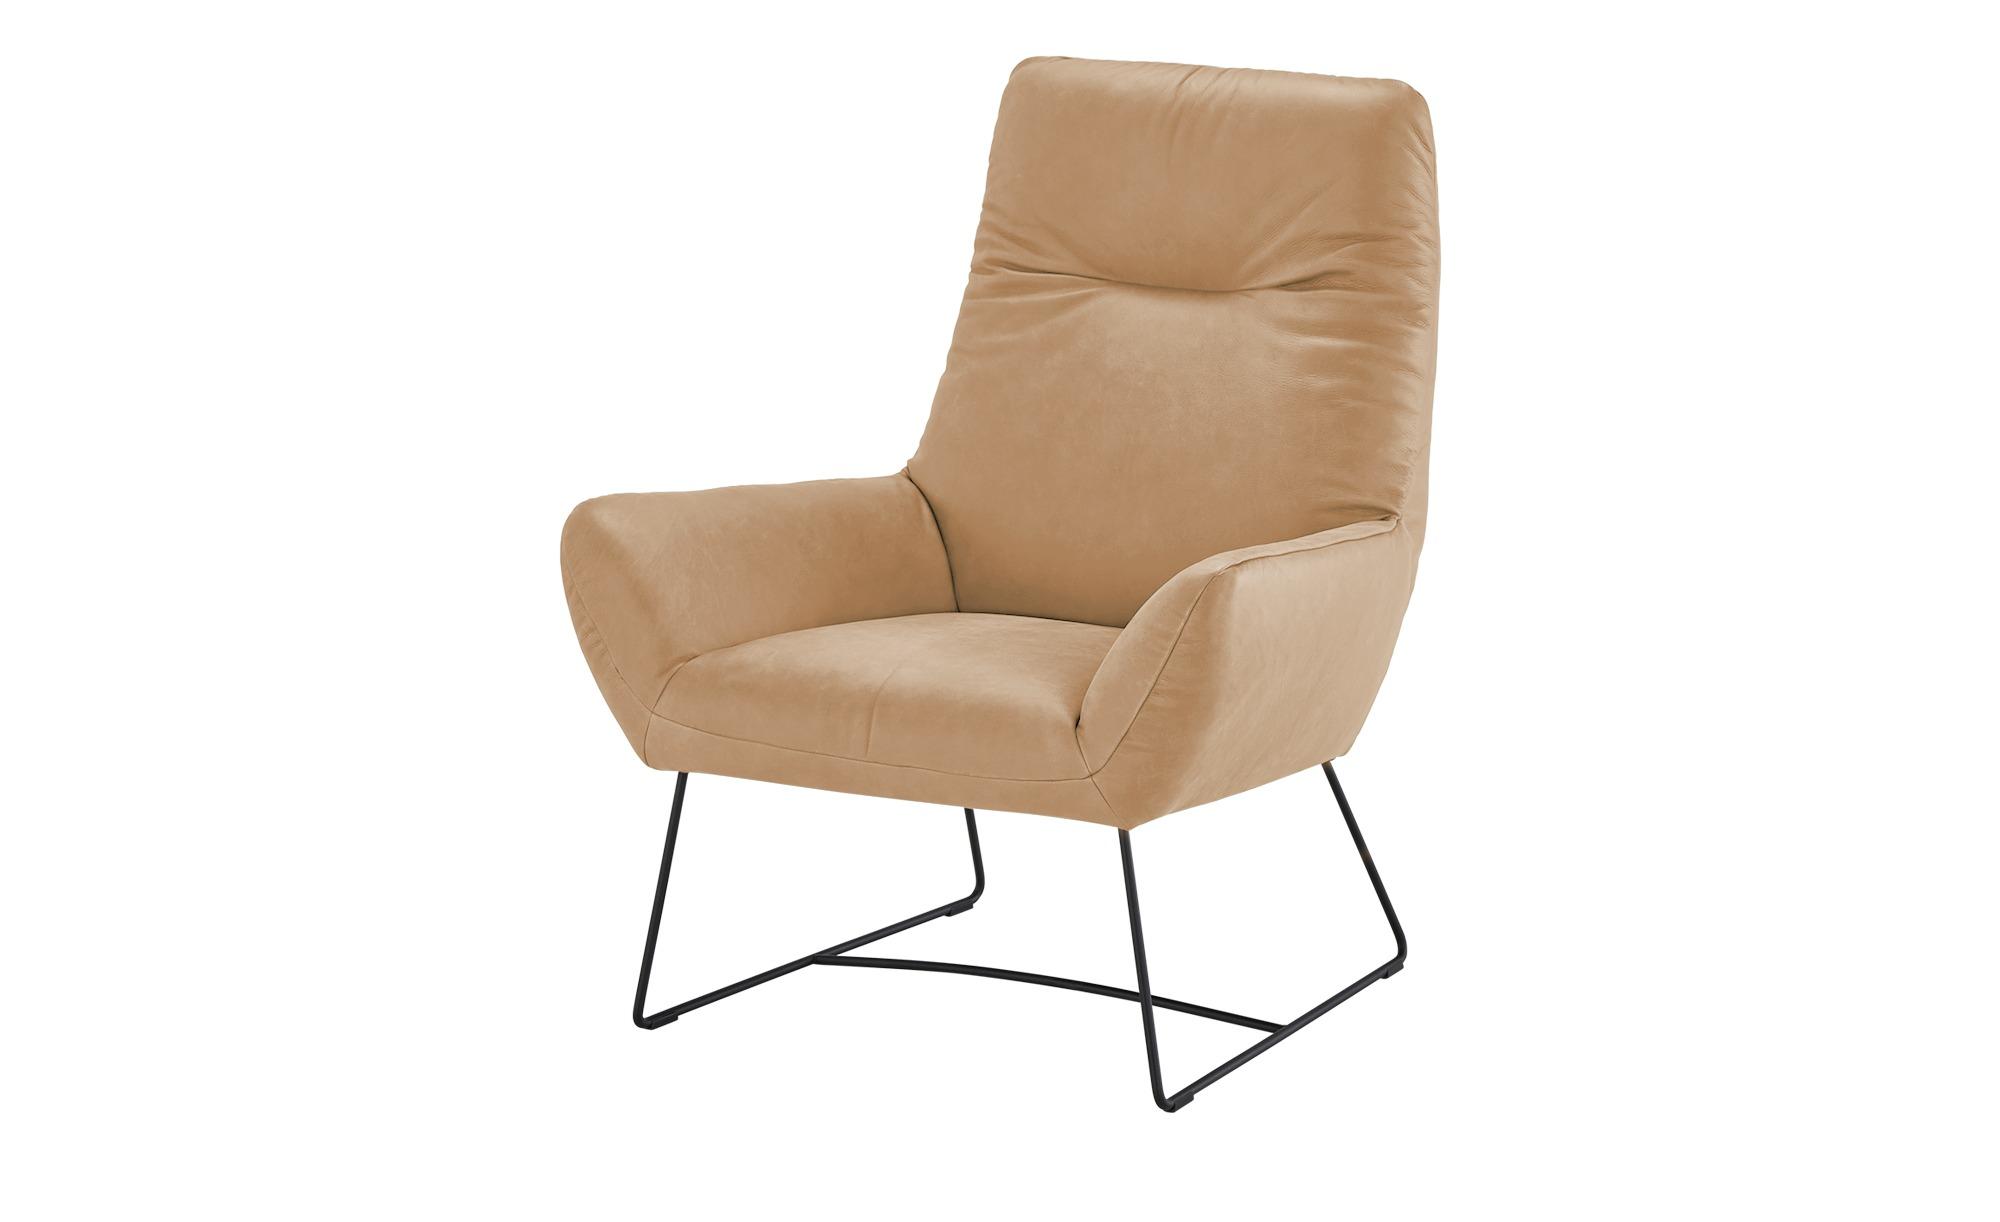 Max Schelling Leder Sessel  Master ¦ beige ¦ Maße (cm): B: 82 H: 102 T: 81 Polstermöbel > Sessel > Ledersessel - Höffner